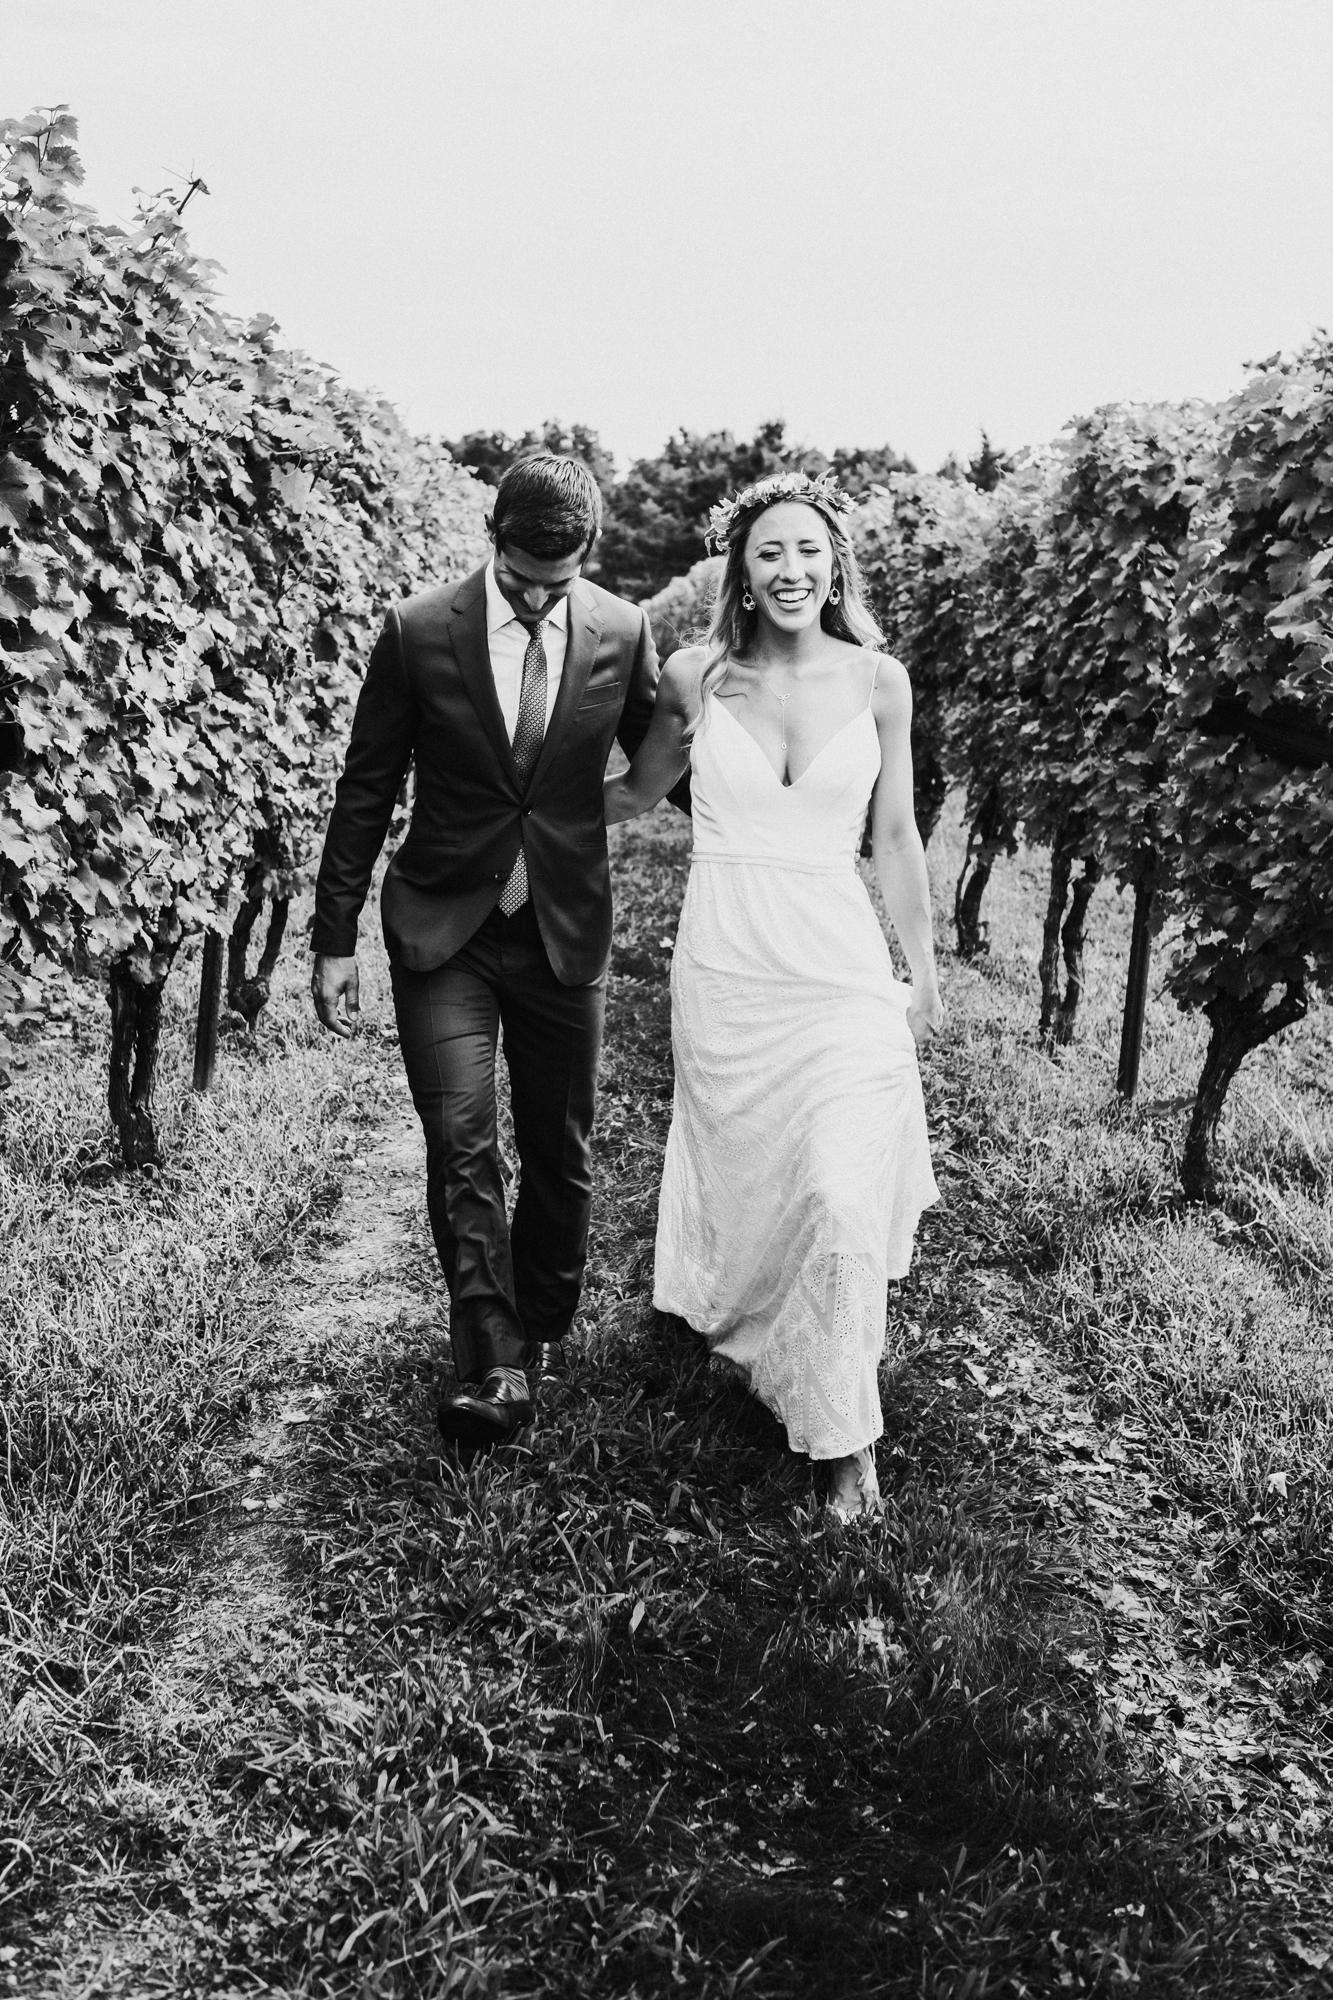 Wedding_Francis_Boucher_Jonathan_Edwards_Winery_2018-28.jpg